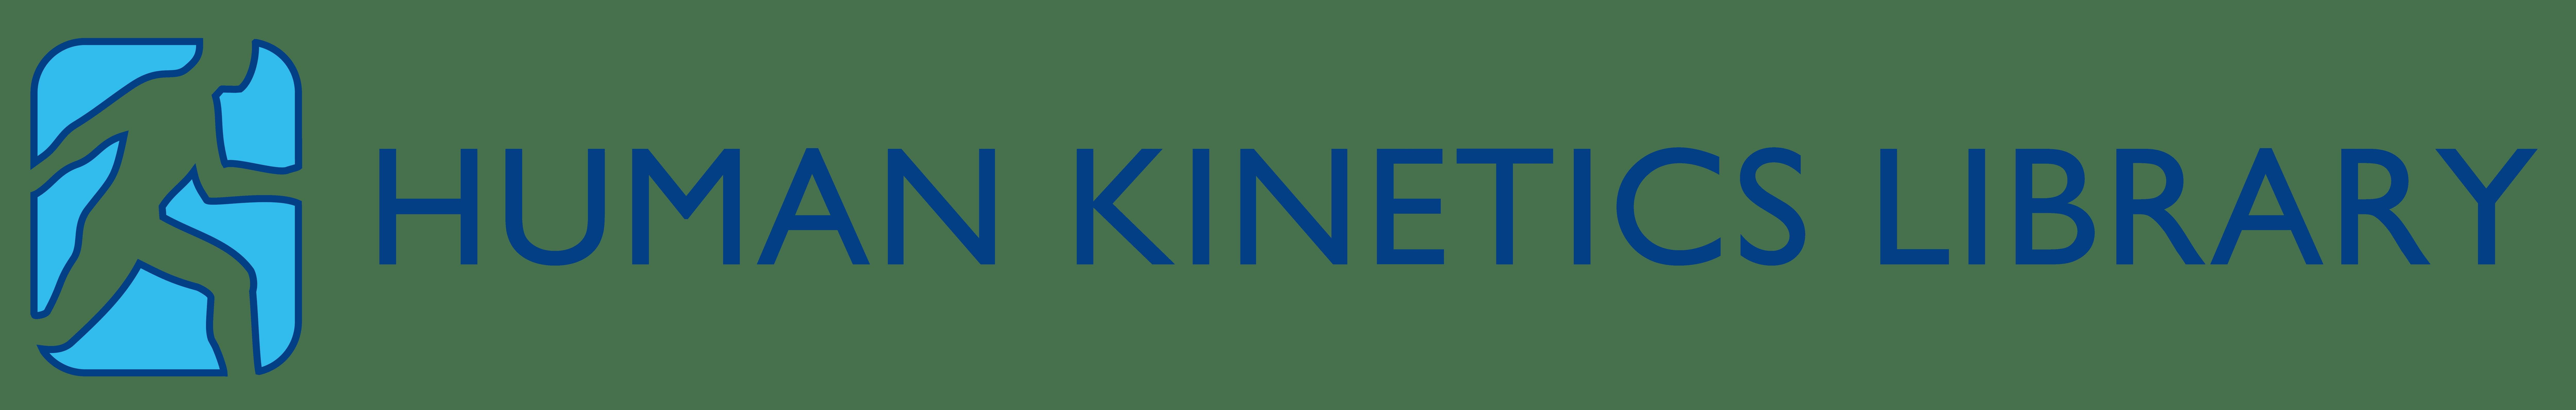 Human Kinetics Library Logo